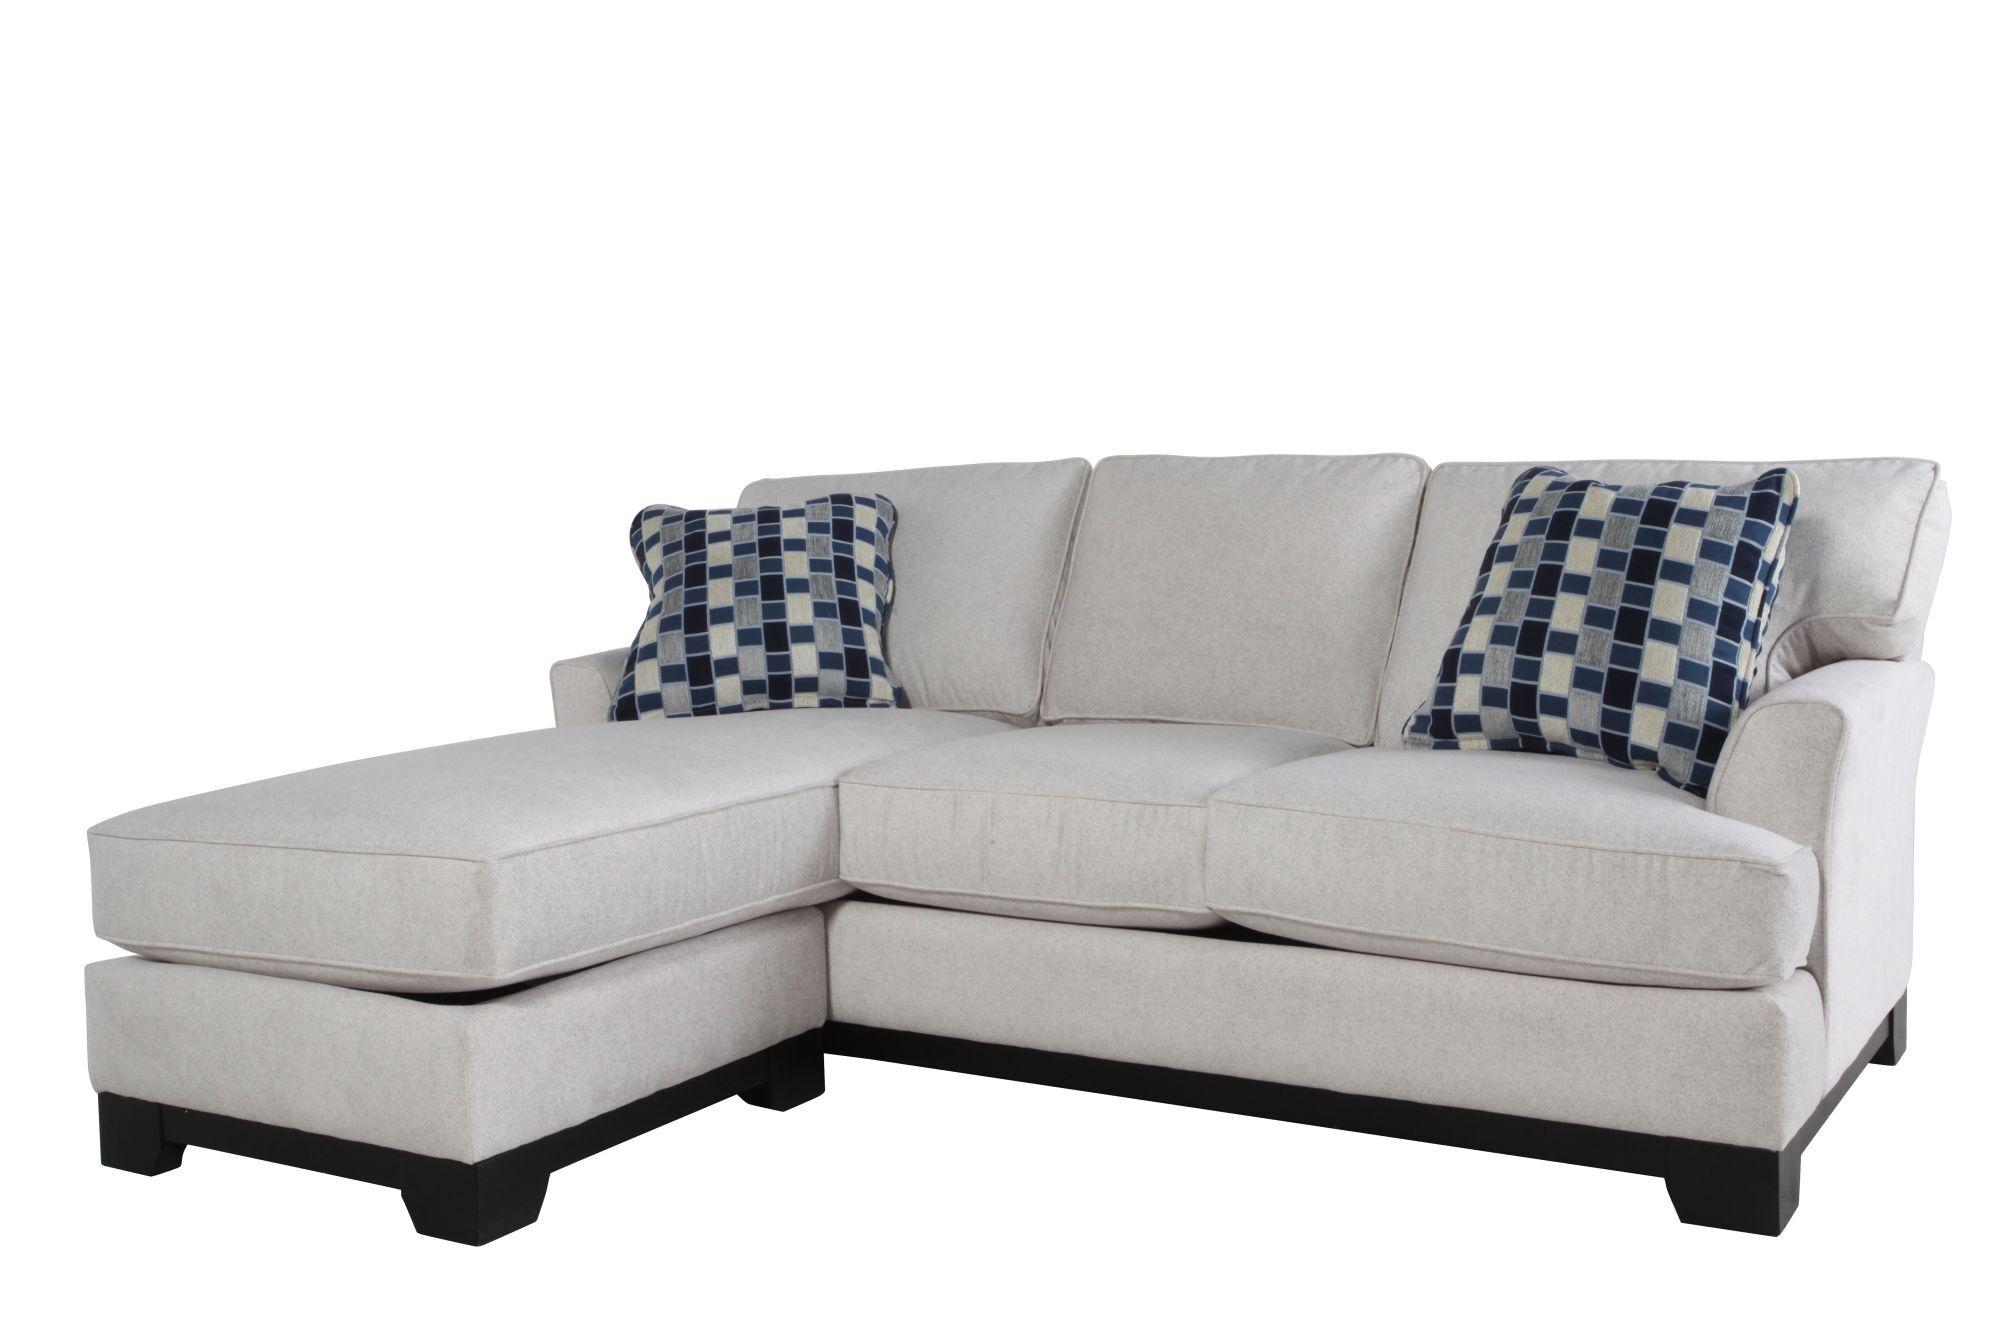 Jonathan Louis Sagittarius Reverse Chaise Sofa